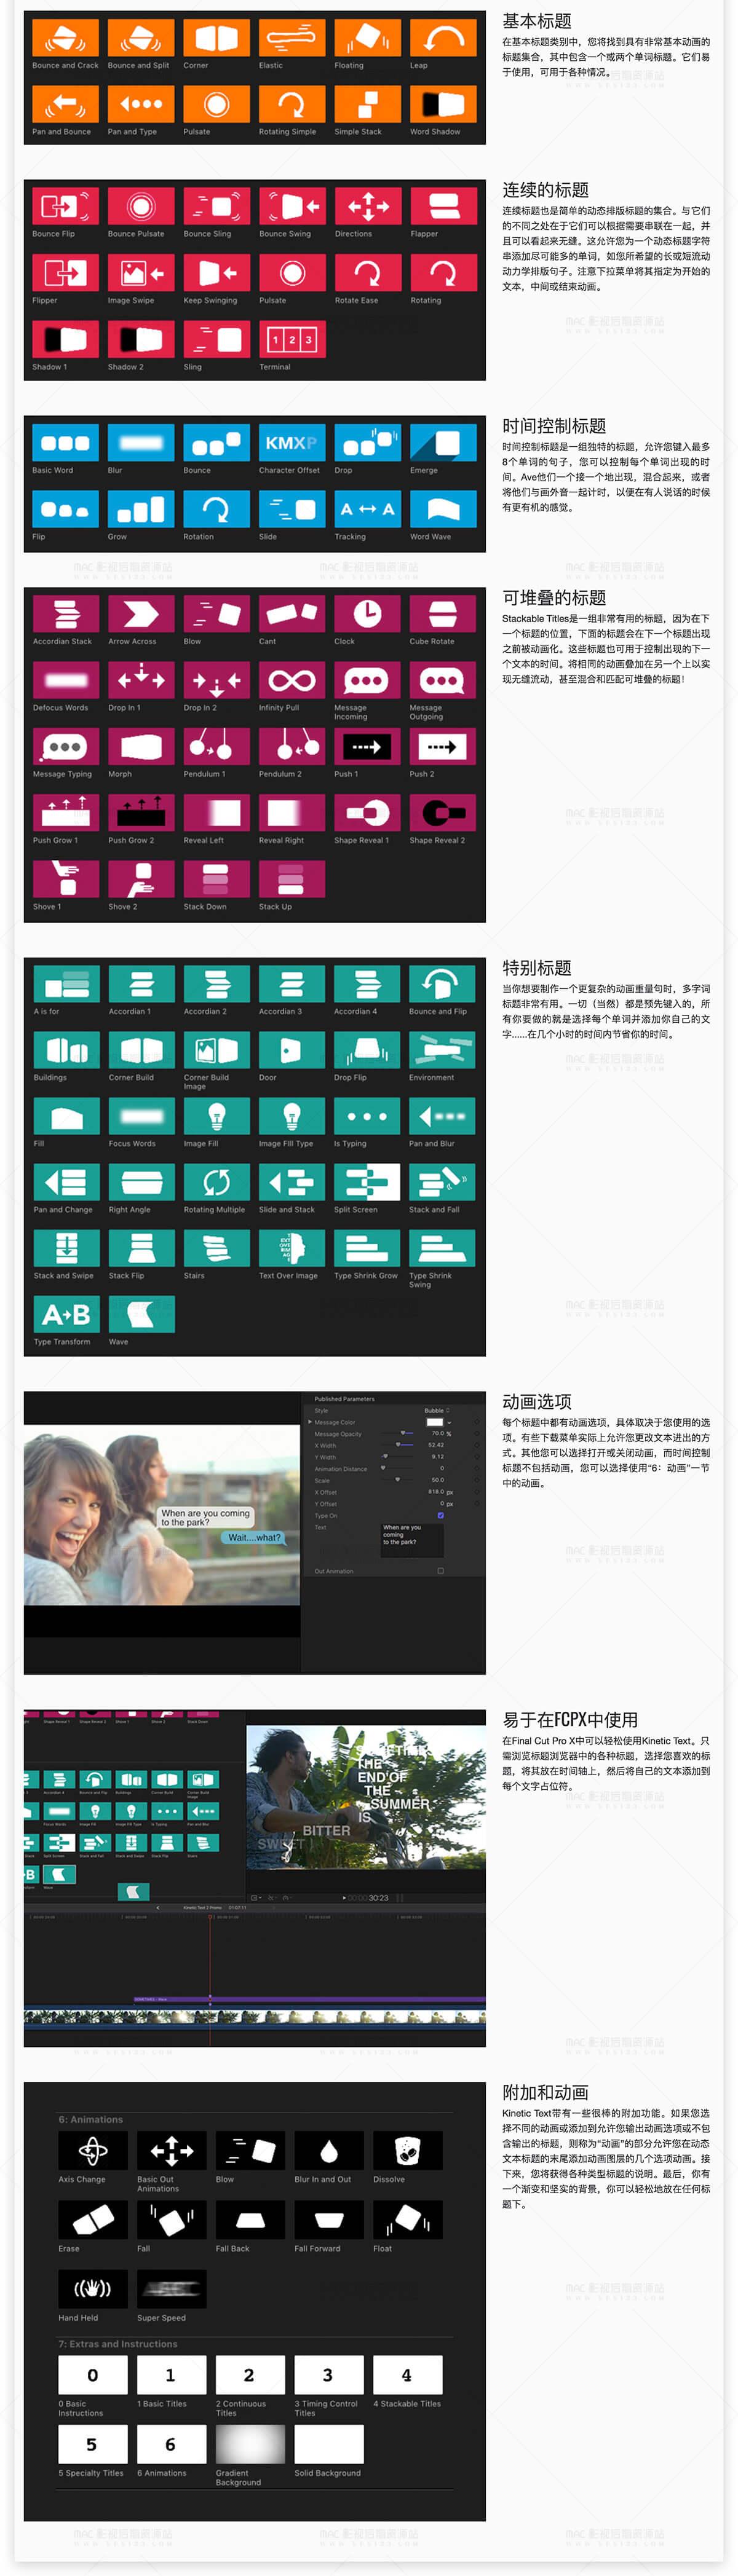 FCPX文字标题工具包 CineFlare KineticText 2.0